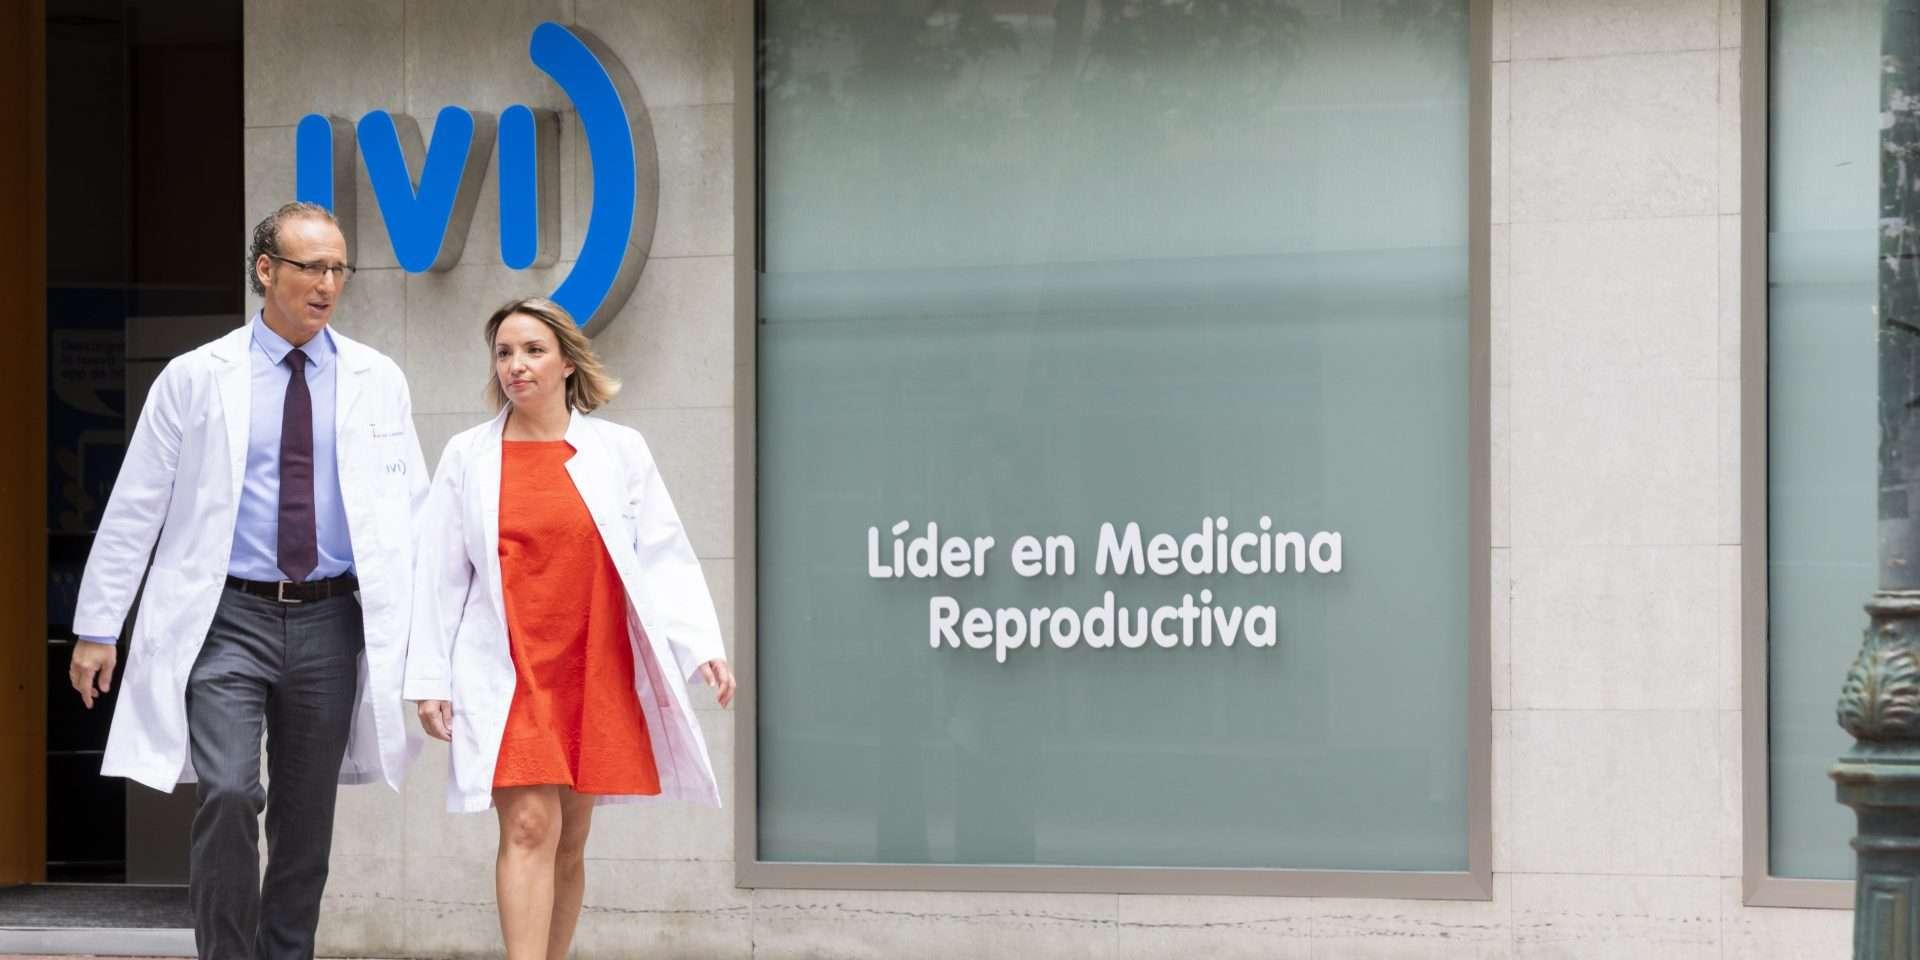 Exteriores clínicas de fertilidad Murcia